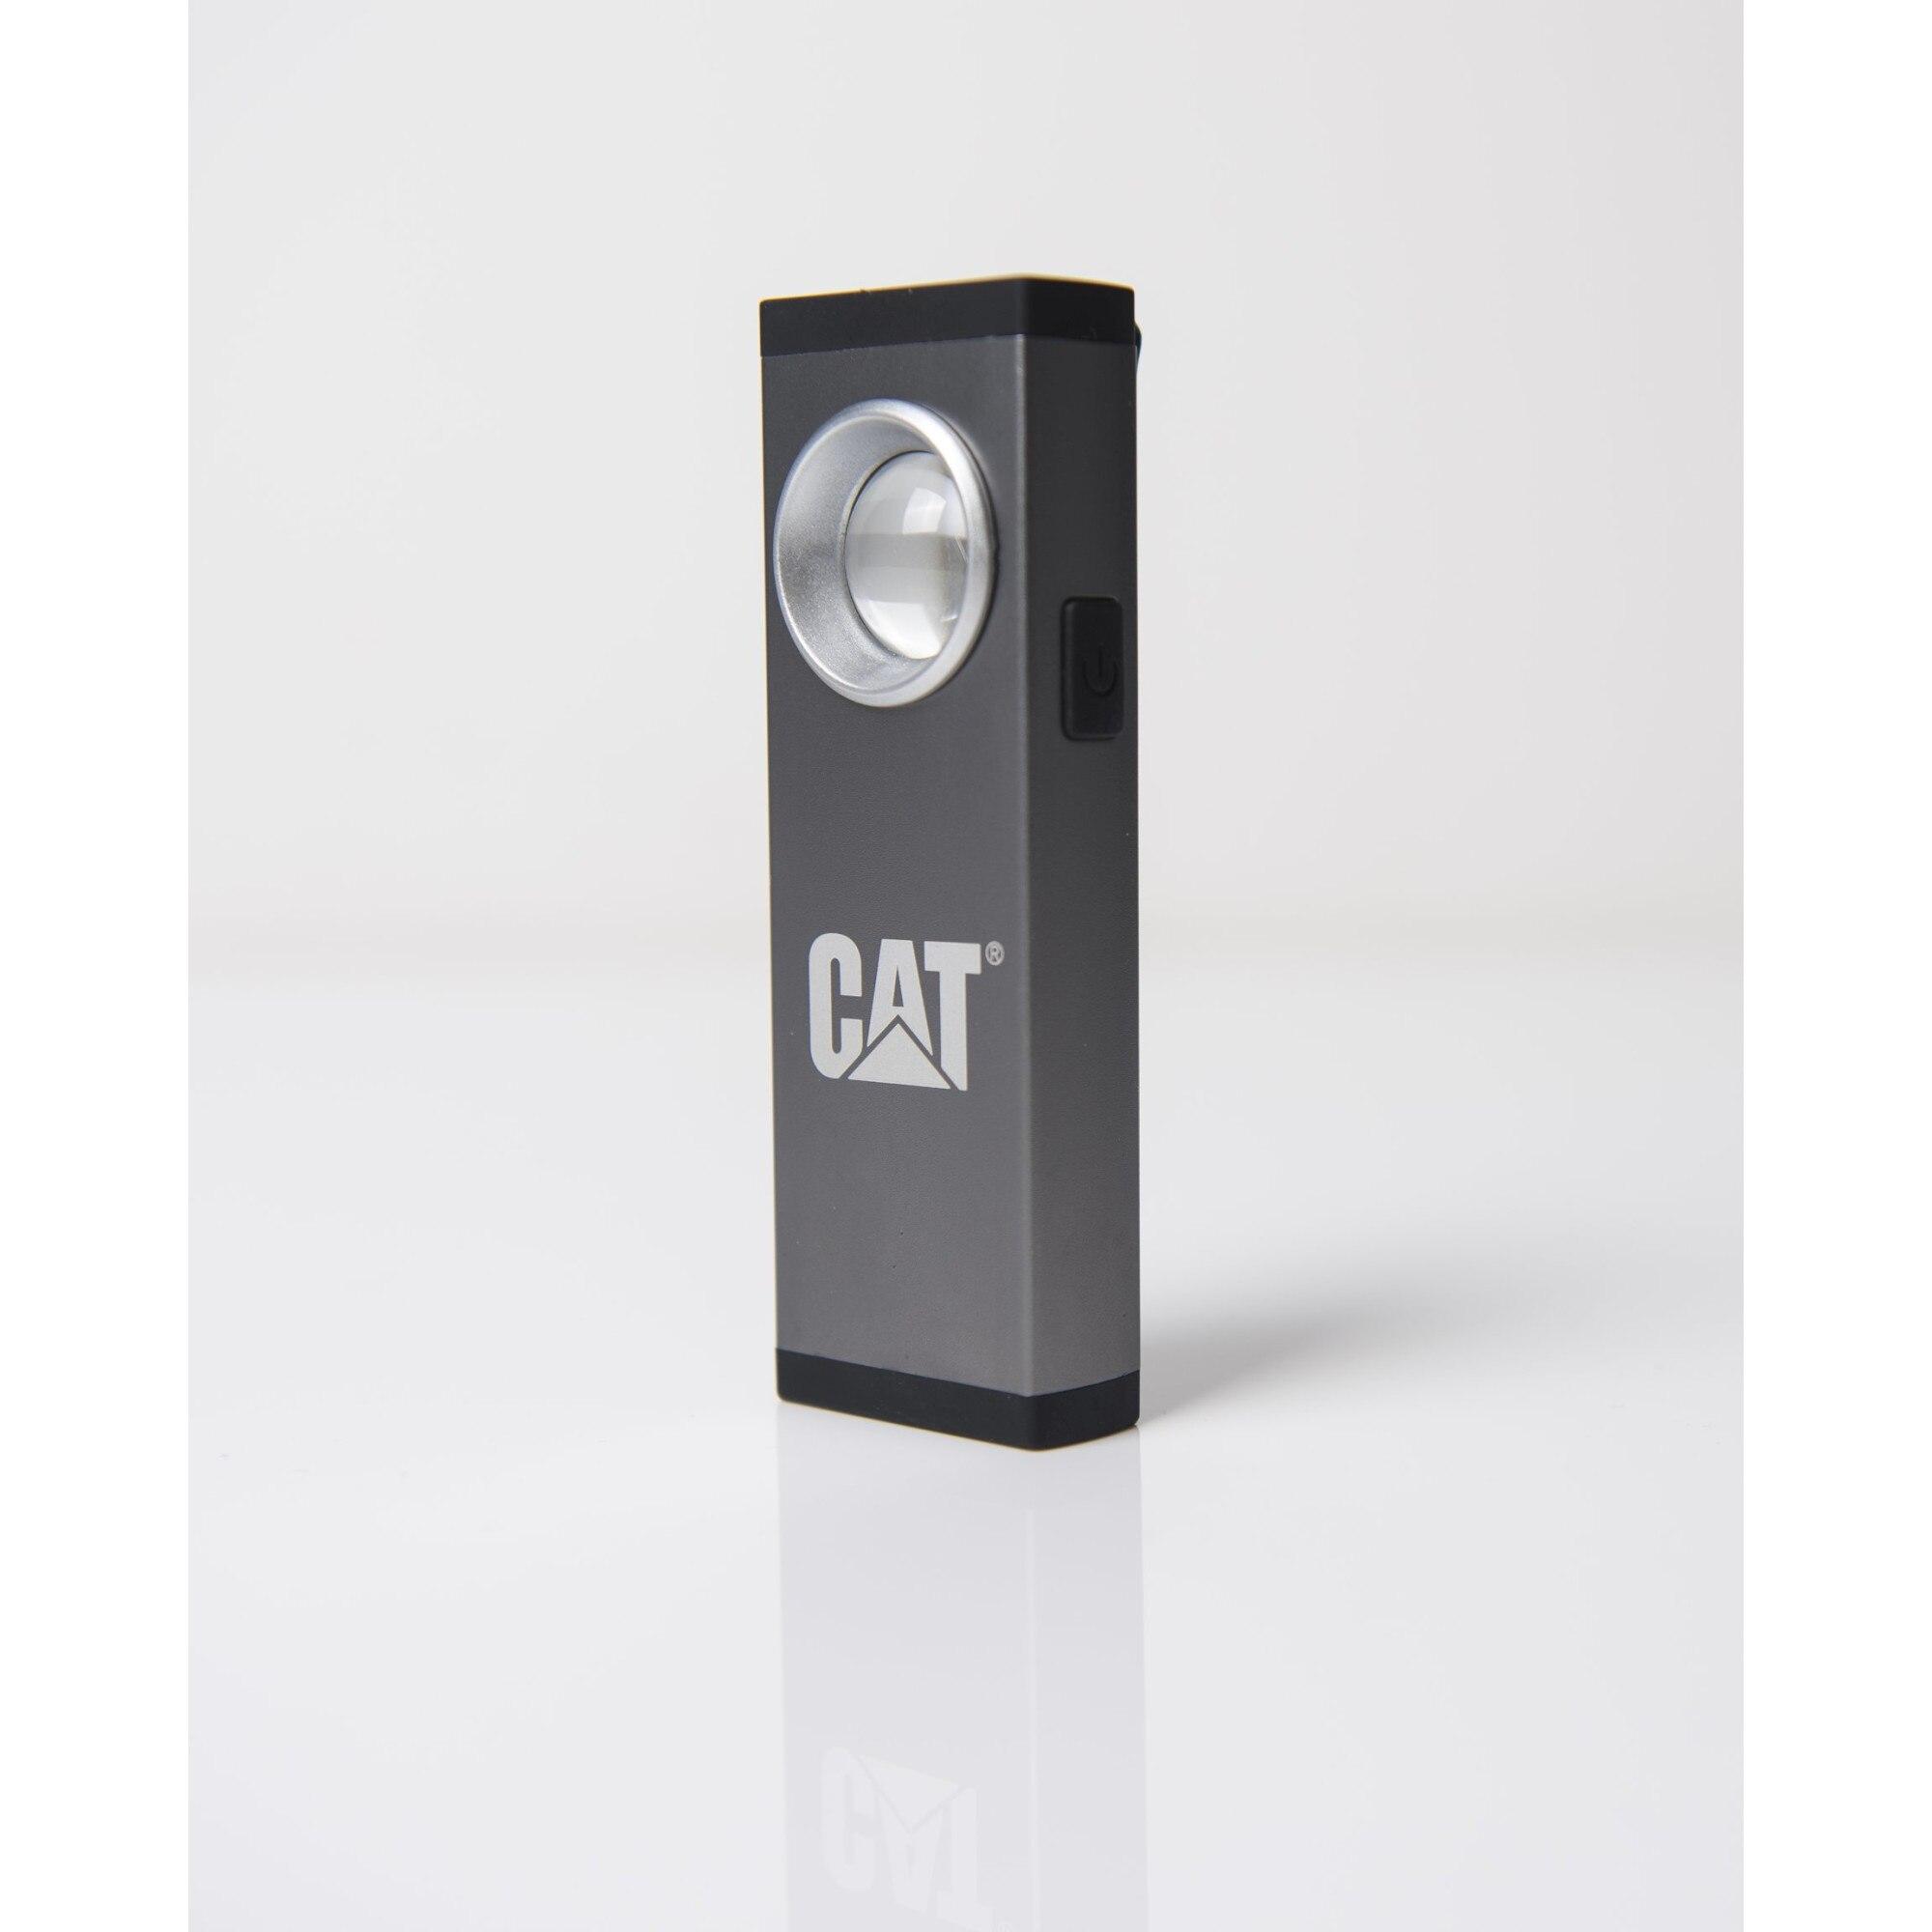 Kezi CAT zseblampa tartomany: 25 m LED 200 lm CT5115 YvctkW